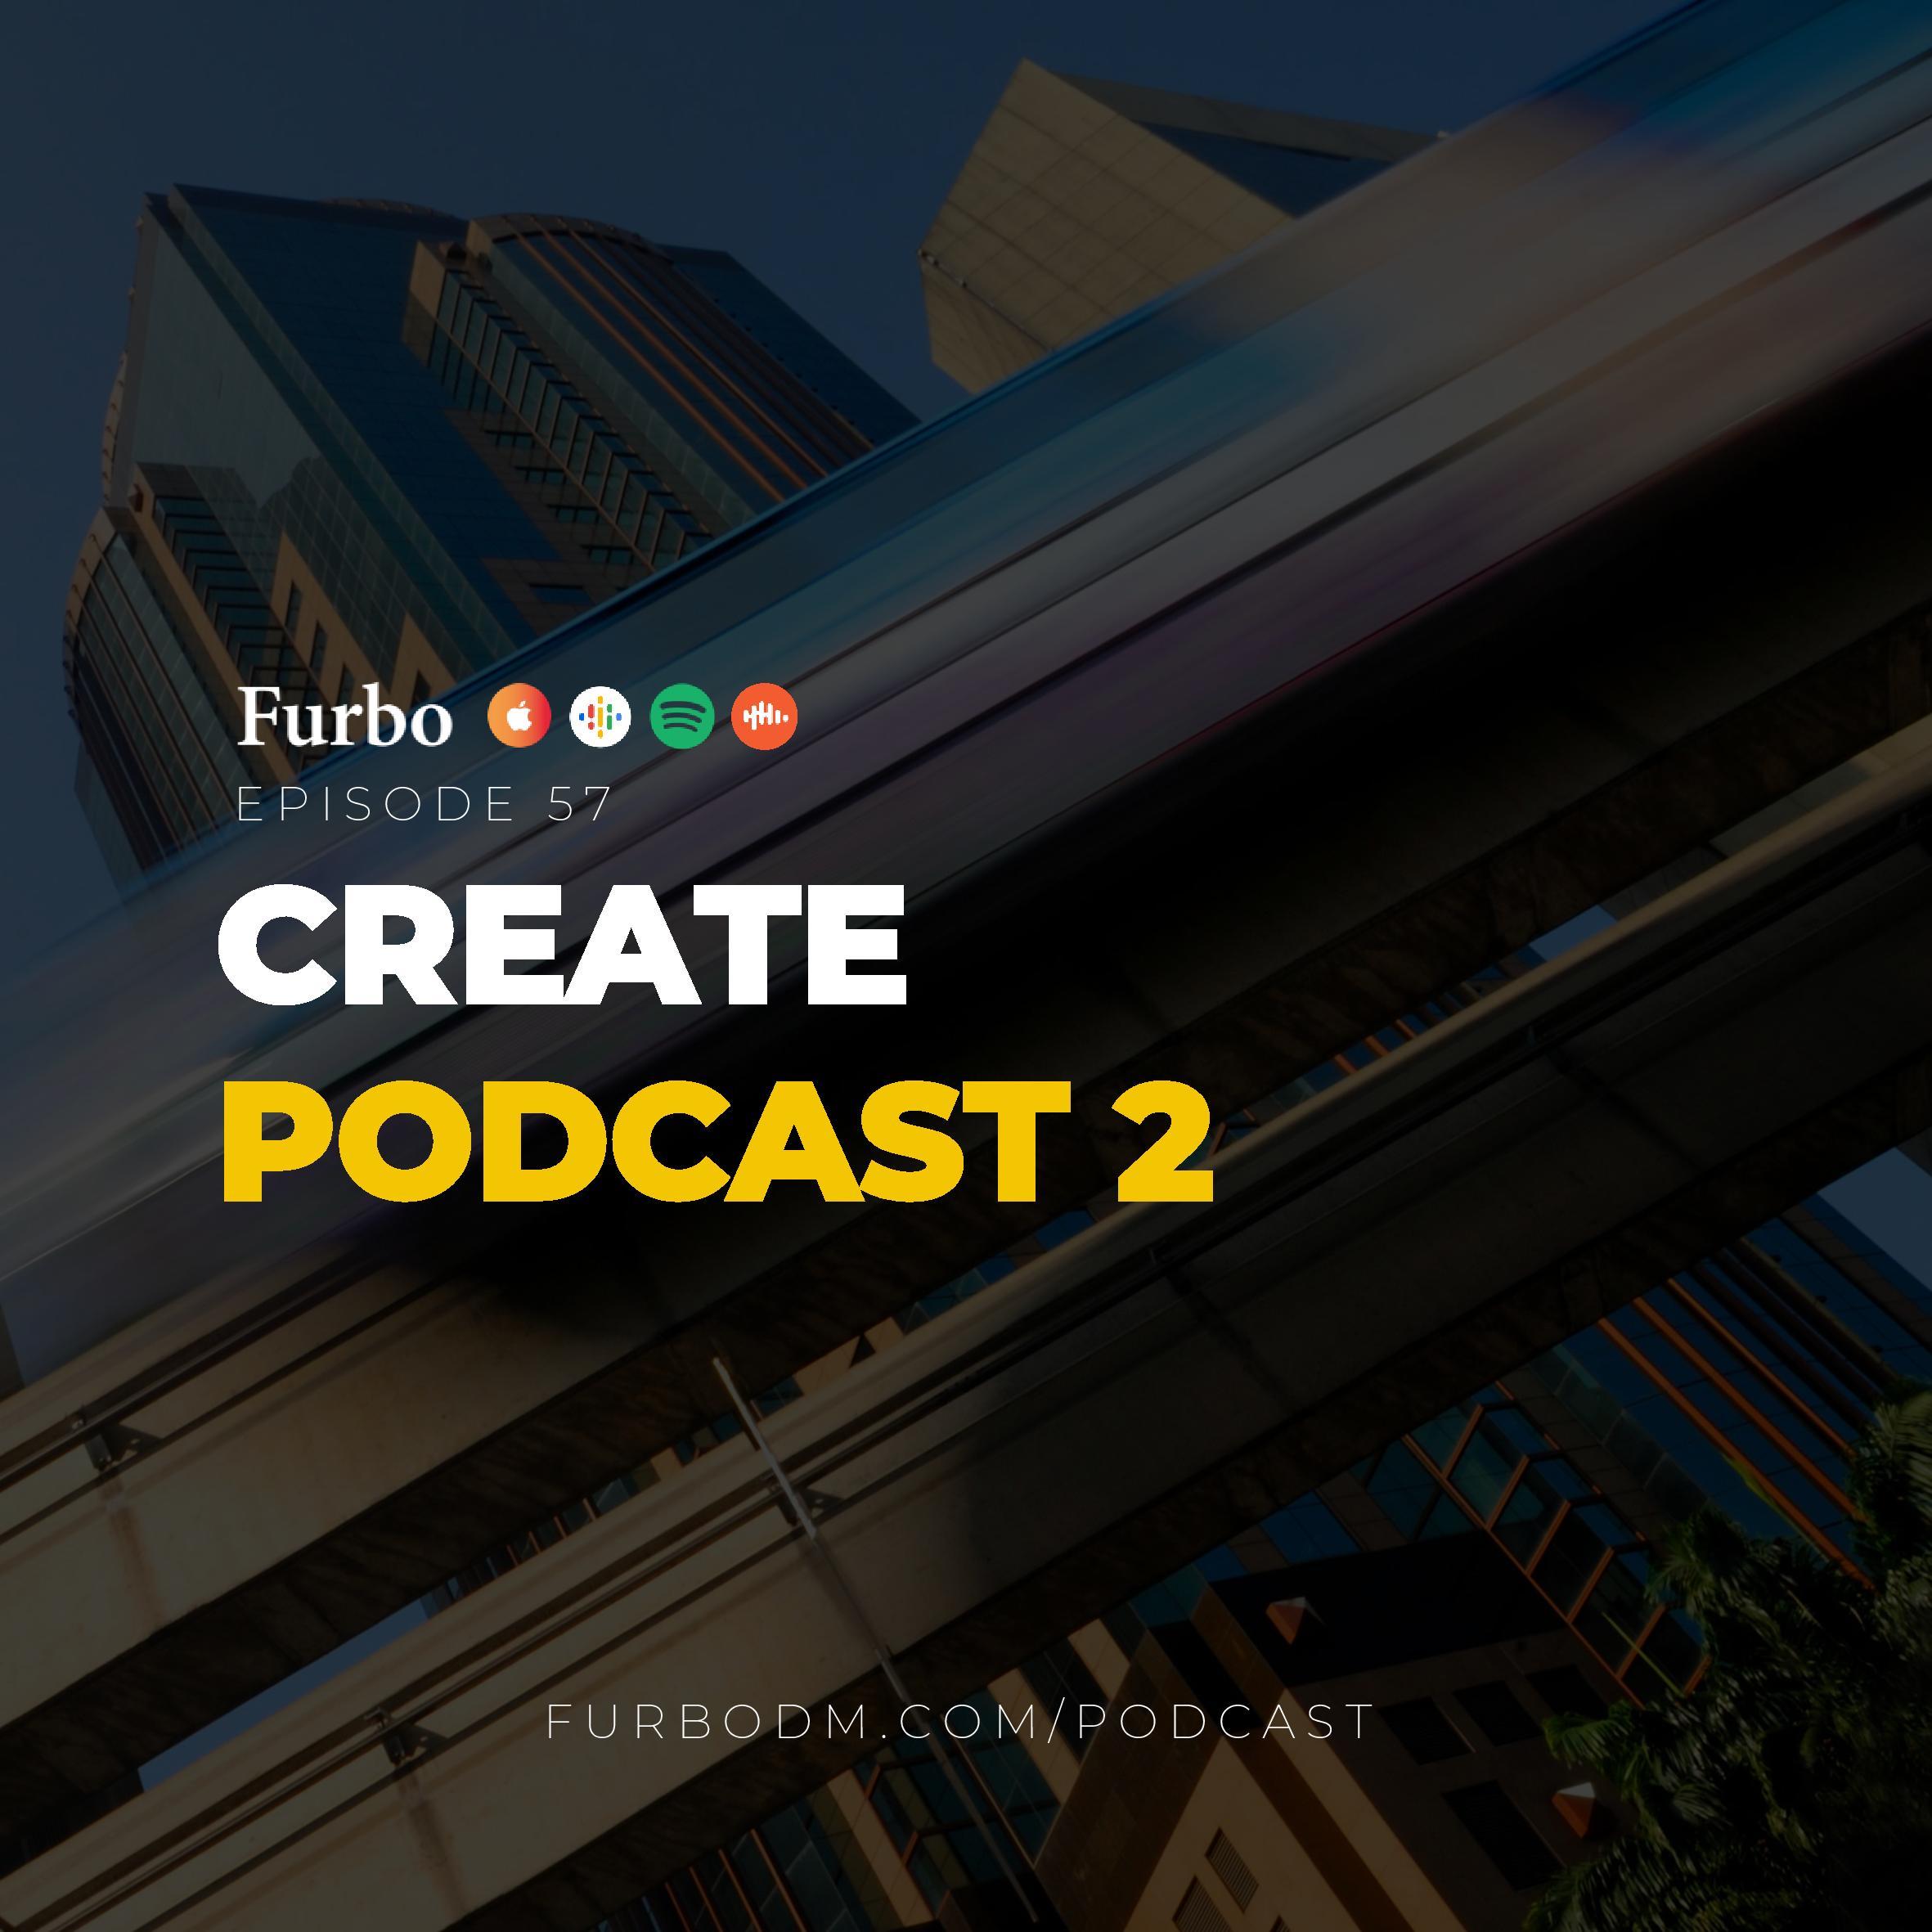 E57: Create Podcast 2   چطور پادکست بسازیم؟ (تدوین و بررسی سرویسهای میزبانی پادکست)